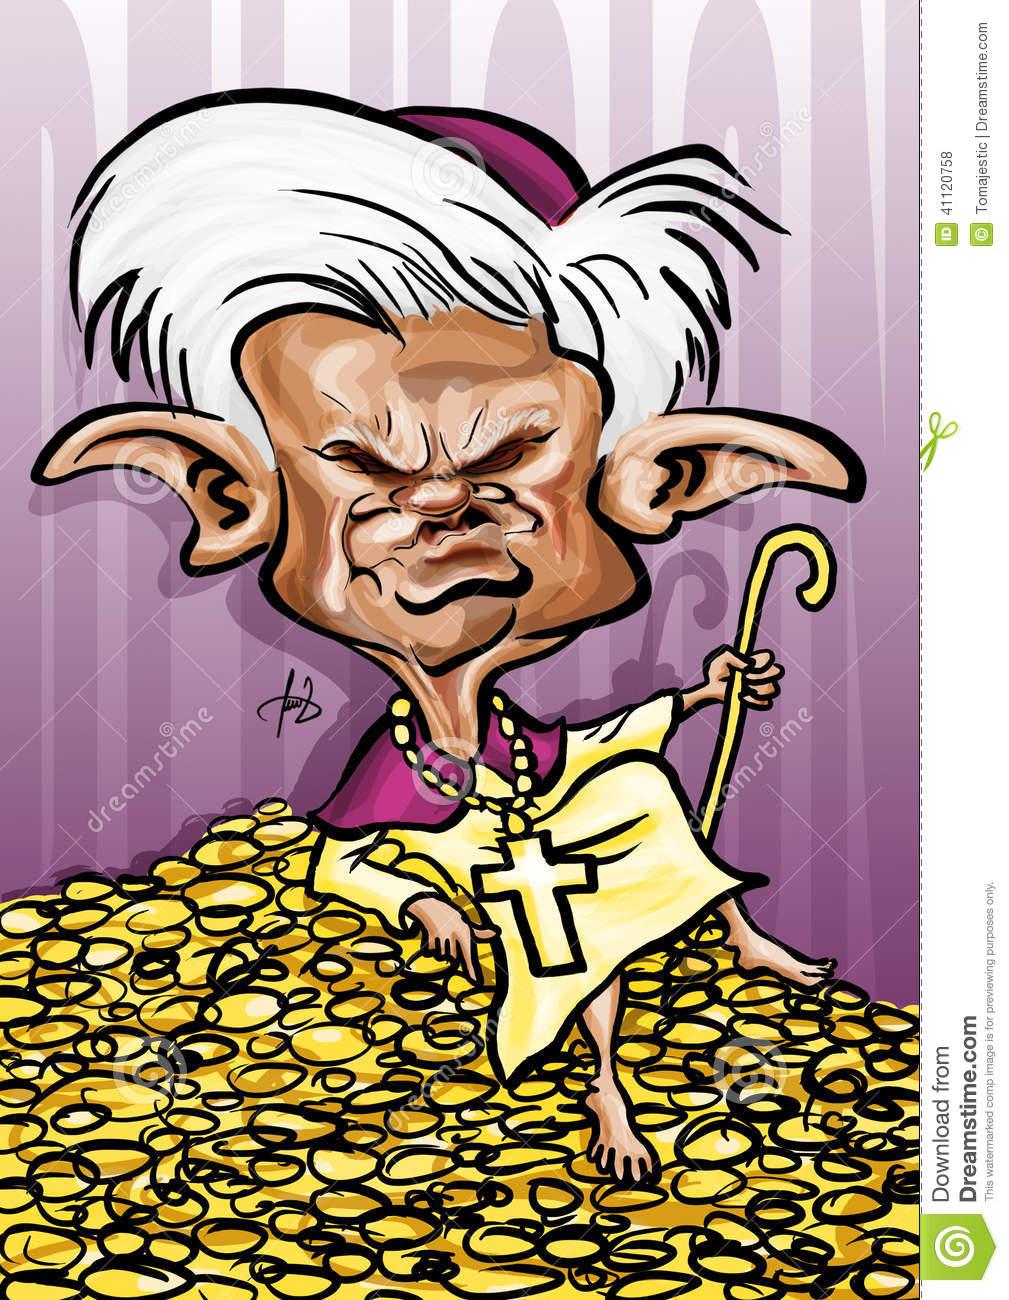 The Pope Benedict XVI Caricature Editorial Stock Photo.